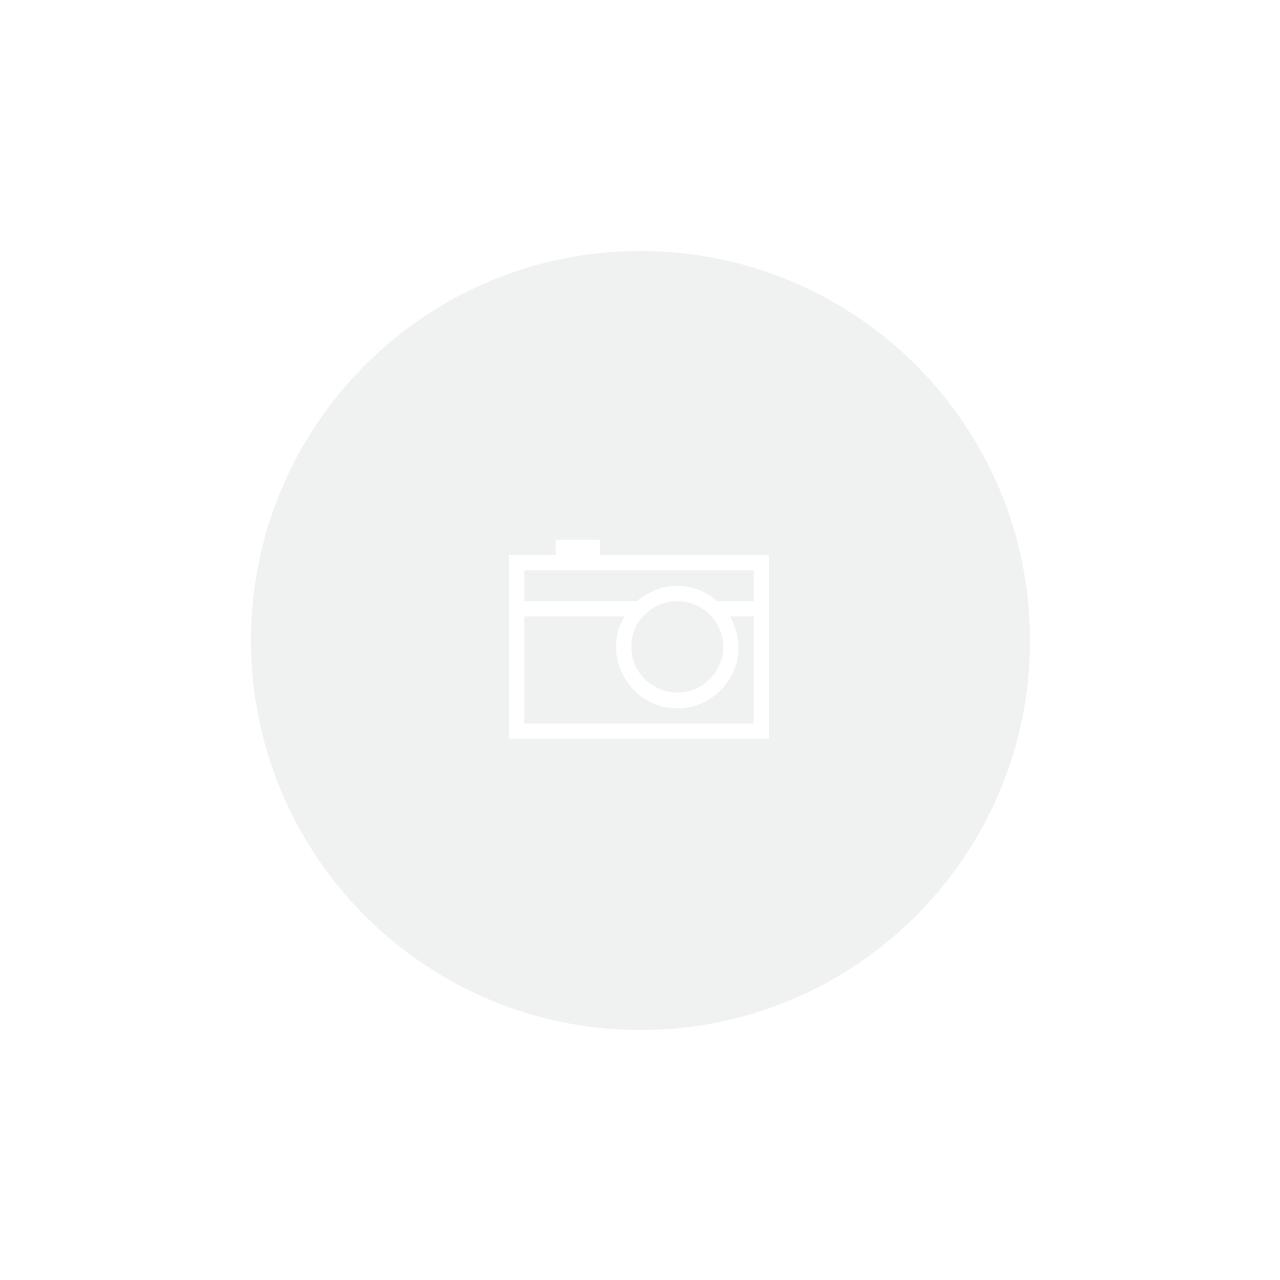 Frigideira Inox 20Cm 2,20 Litros Allegra Tramontina